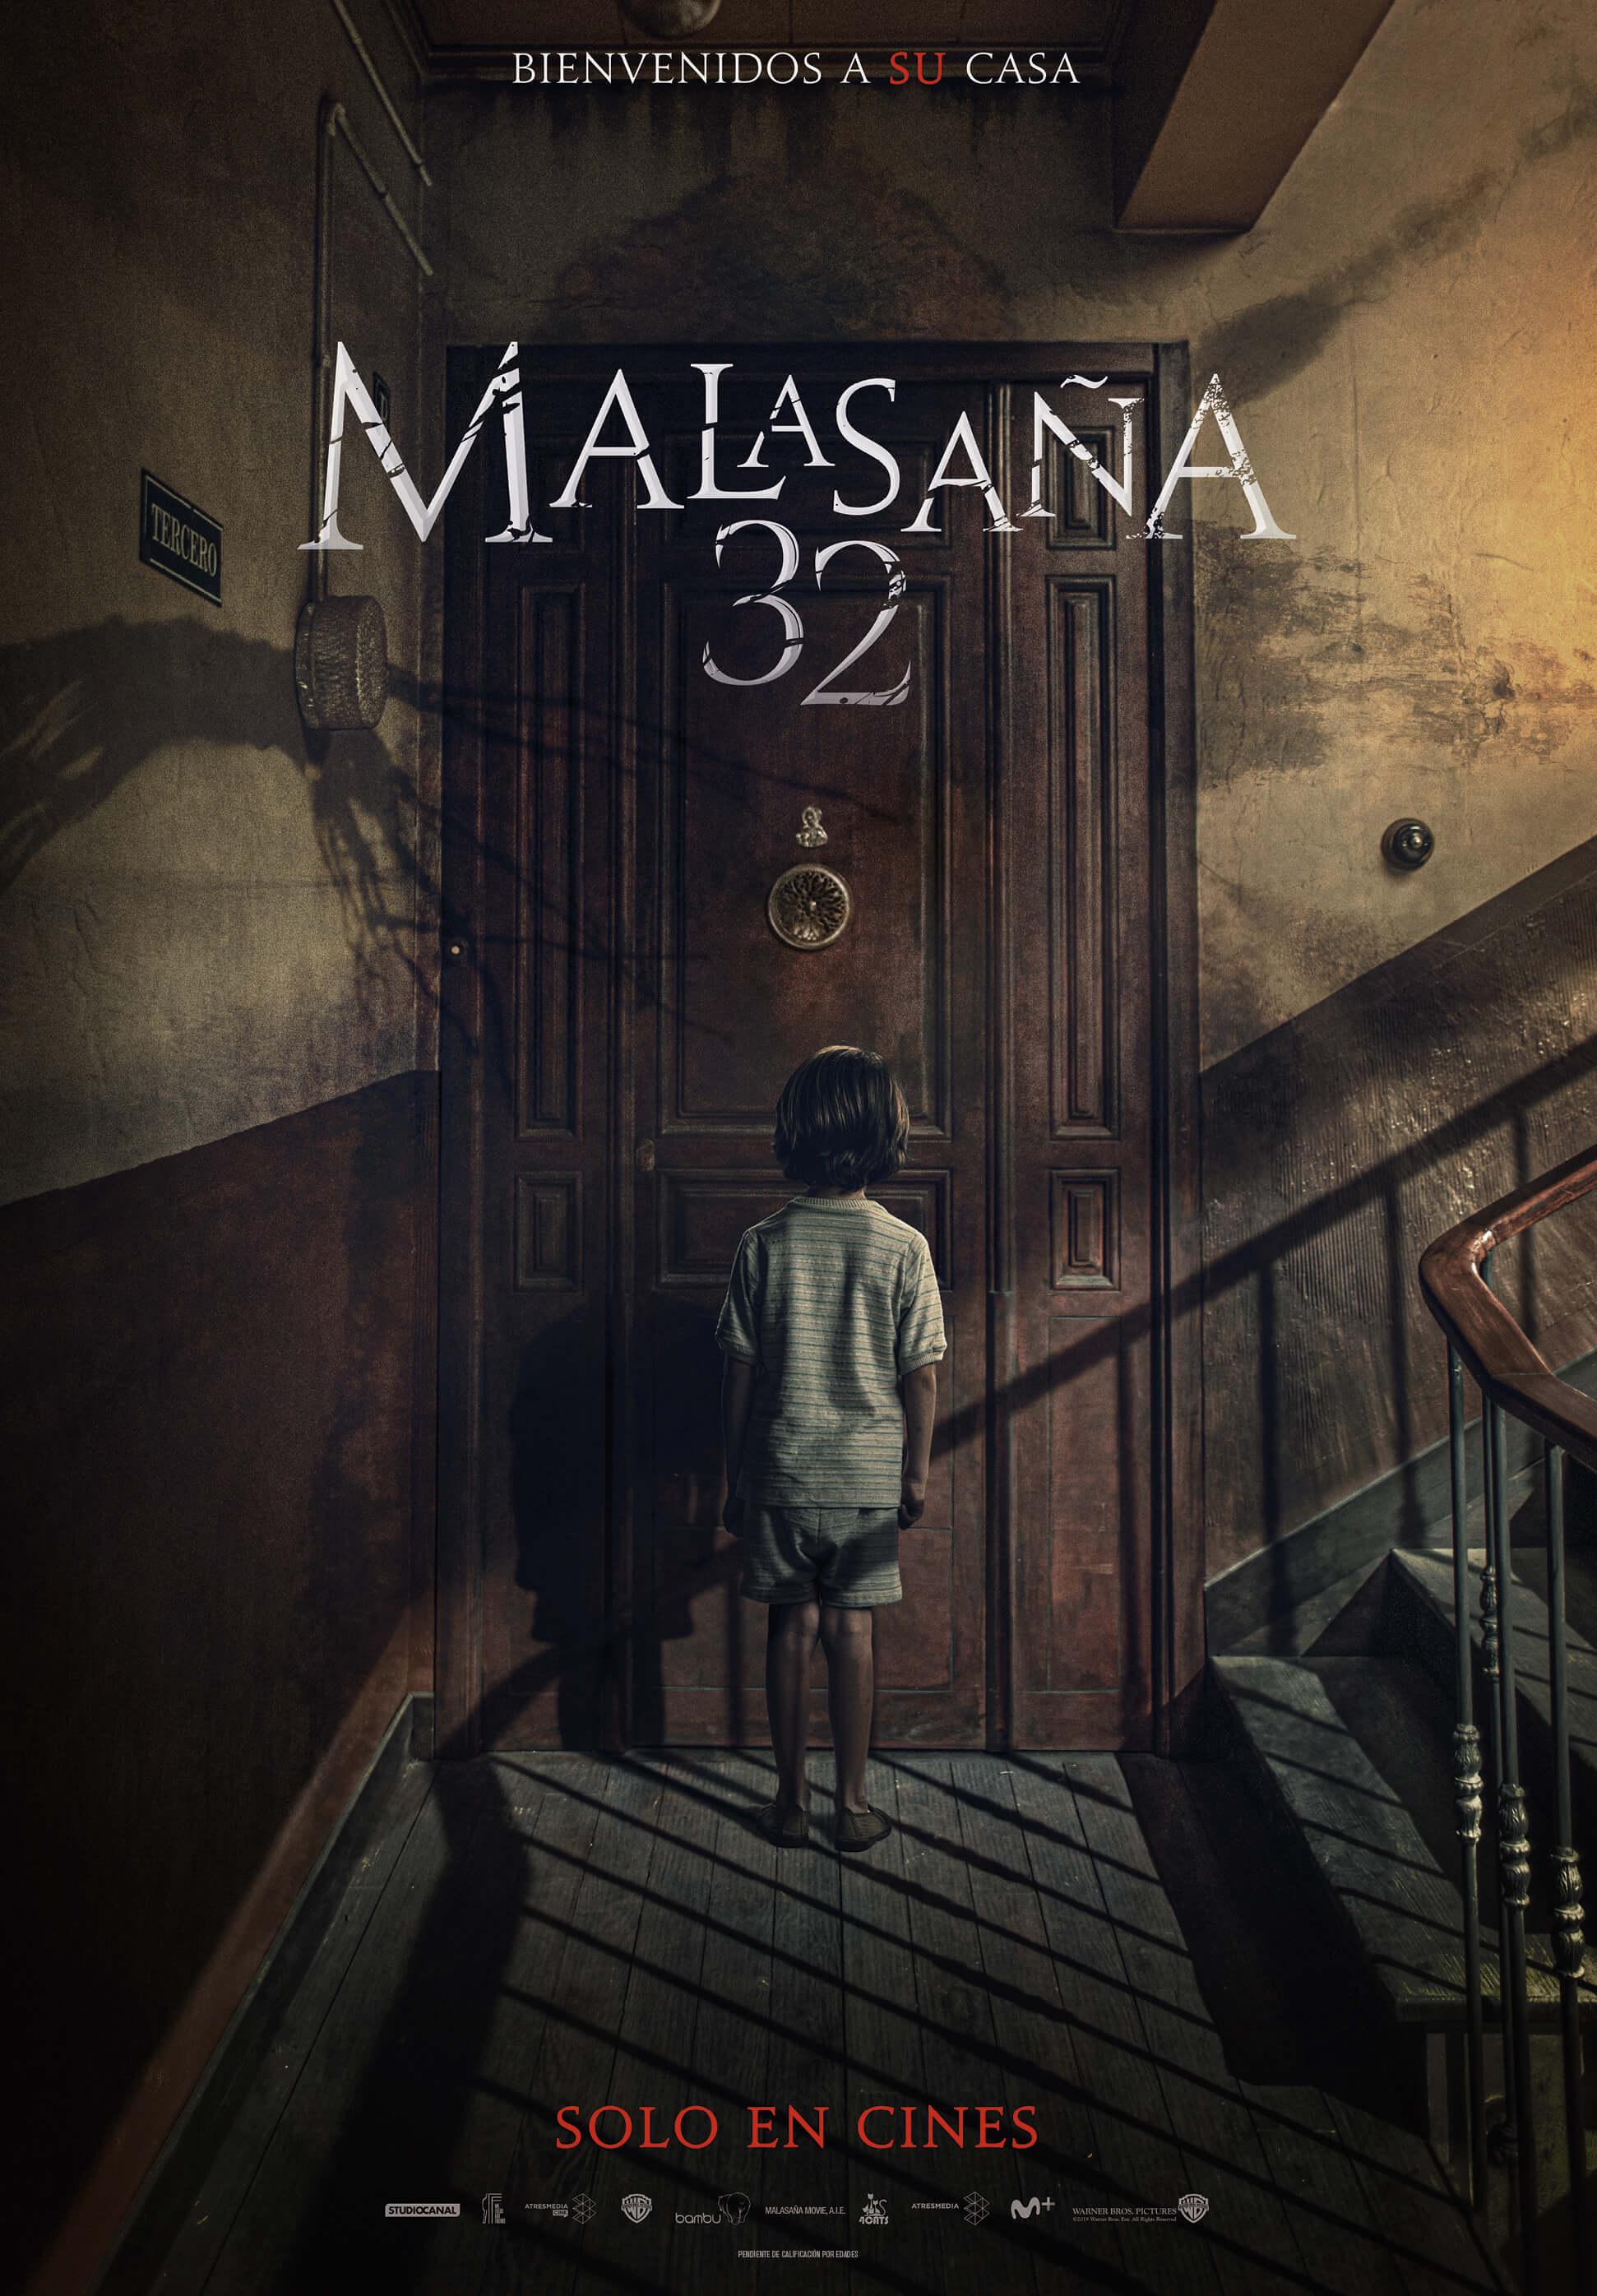 Poster Malasaña 32